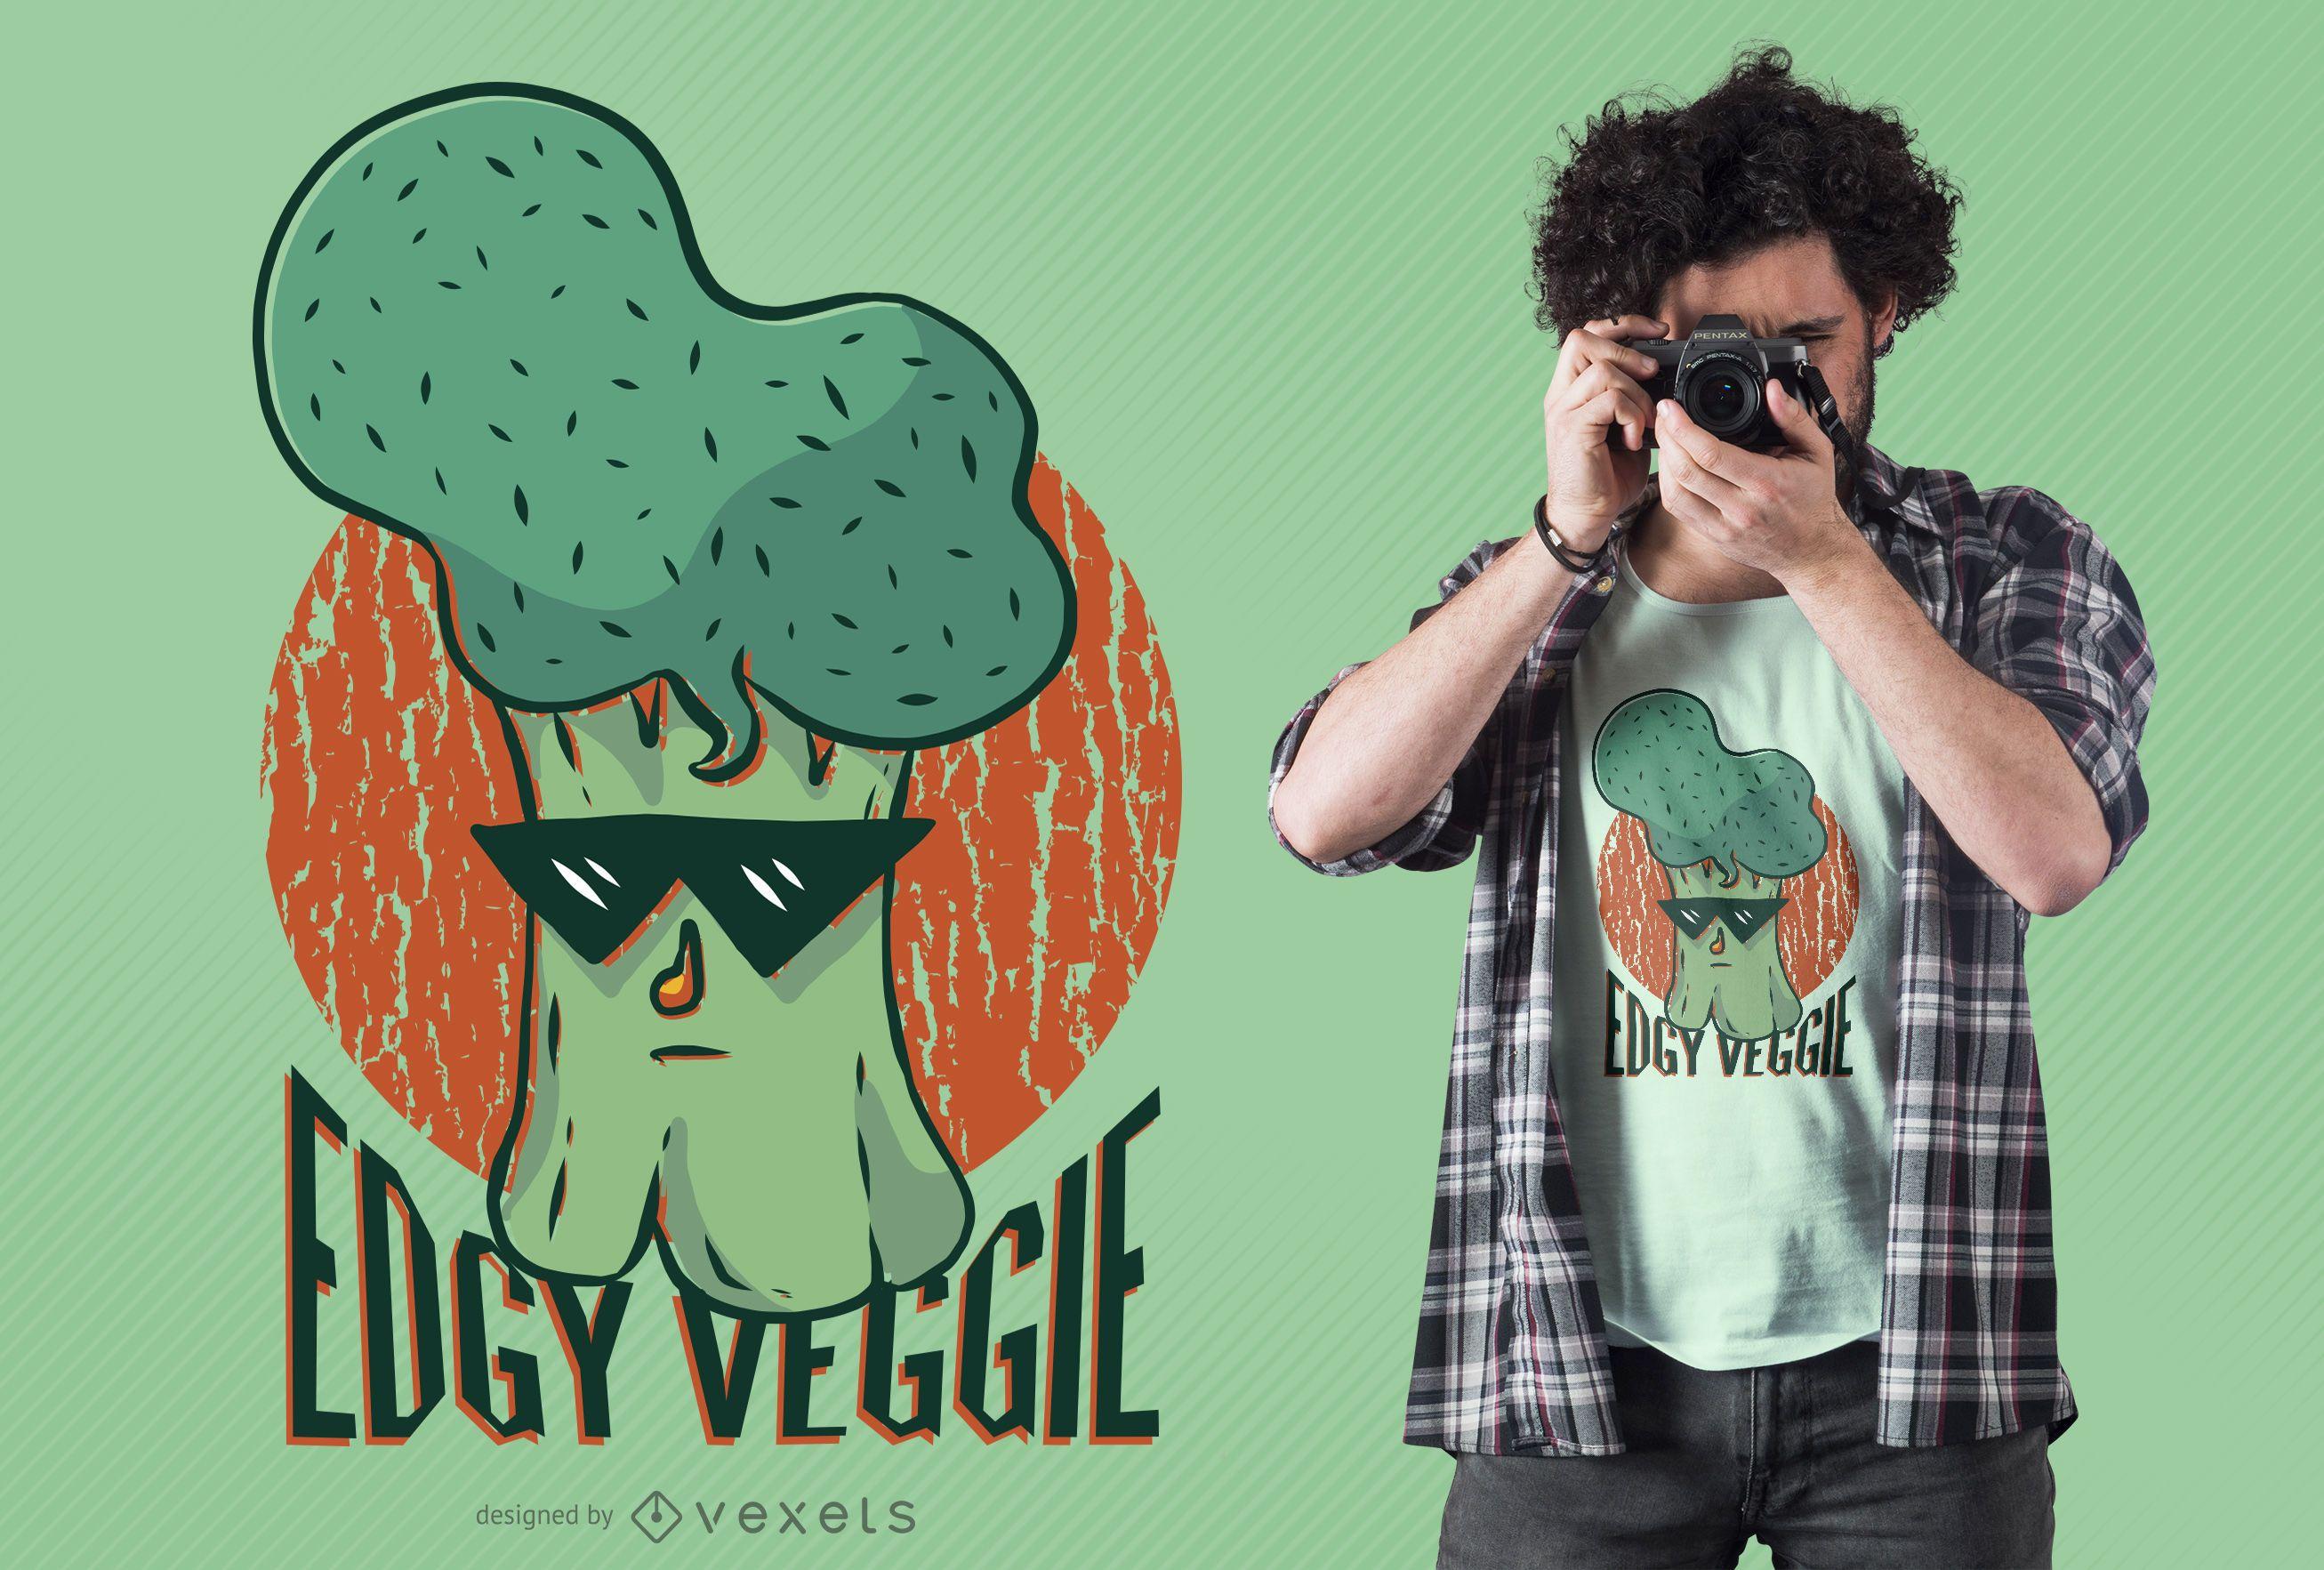 Edgy Veggie T-shirt Design